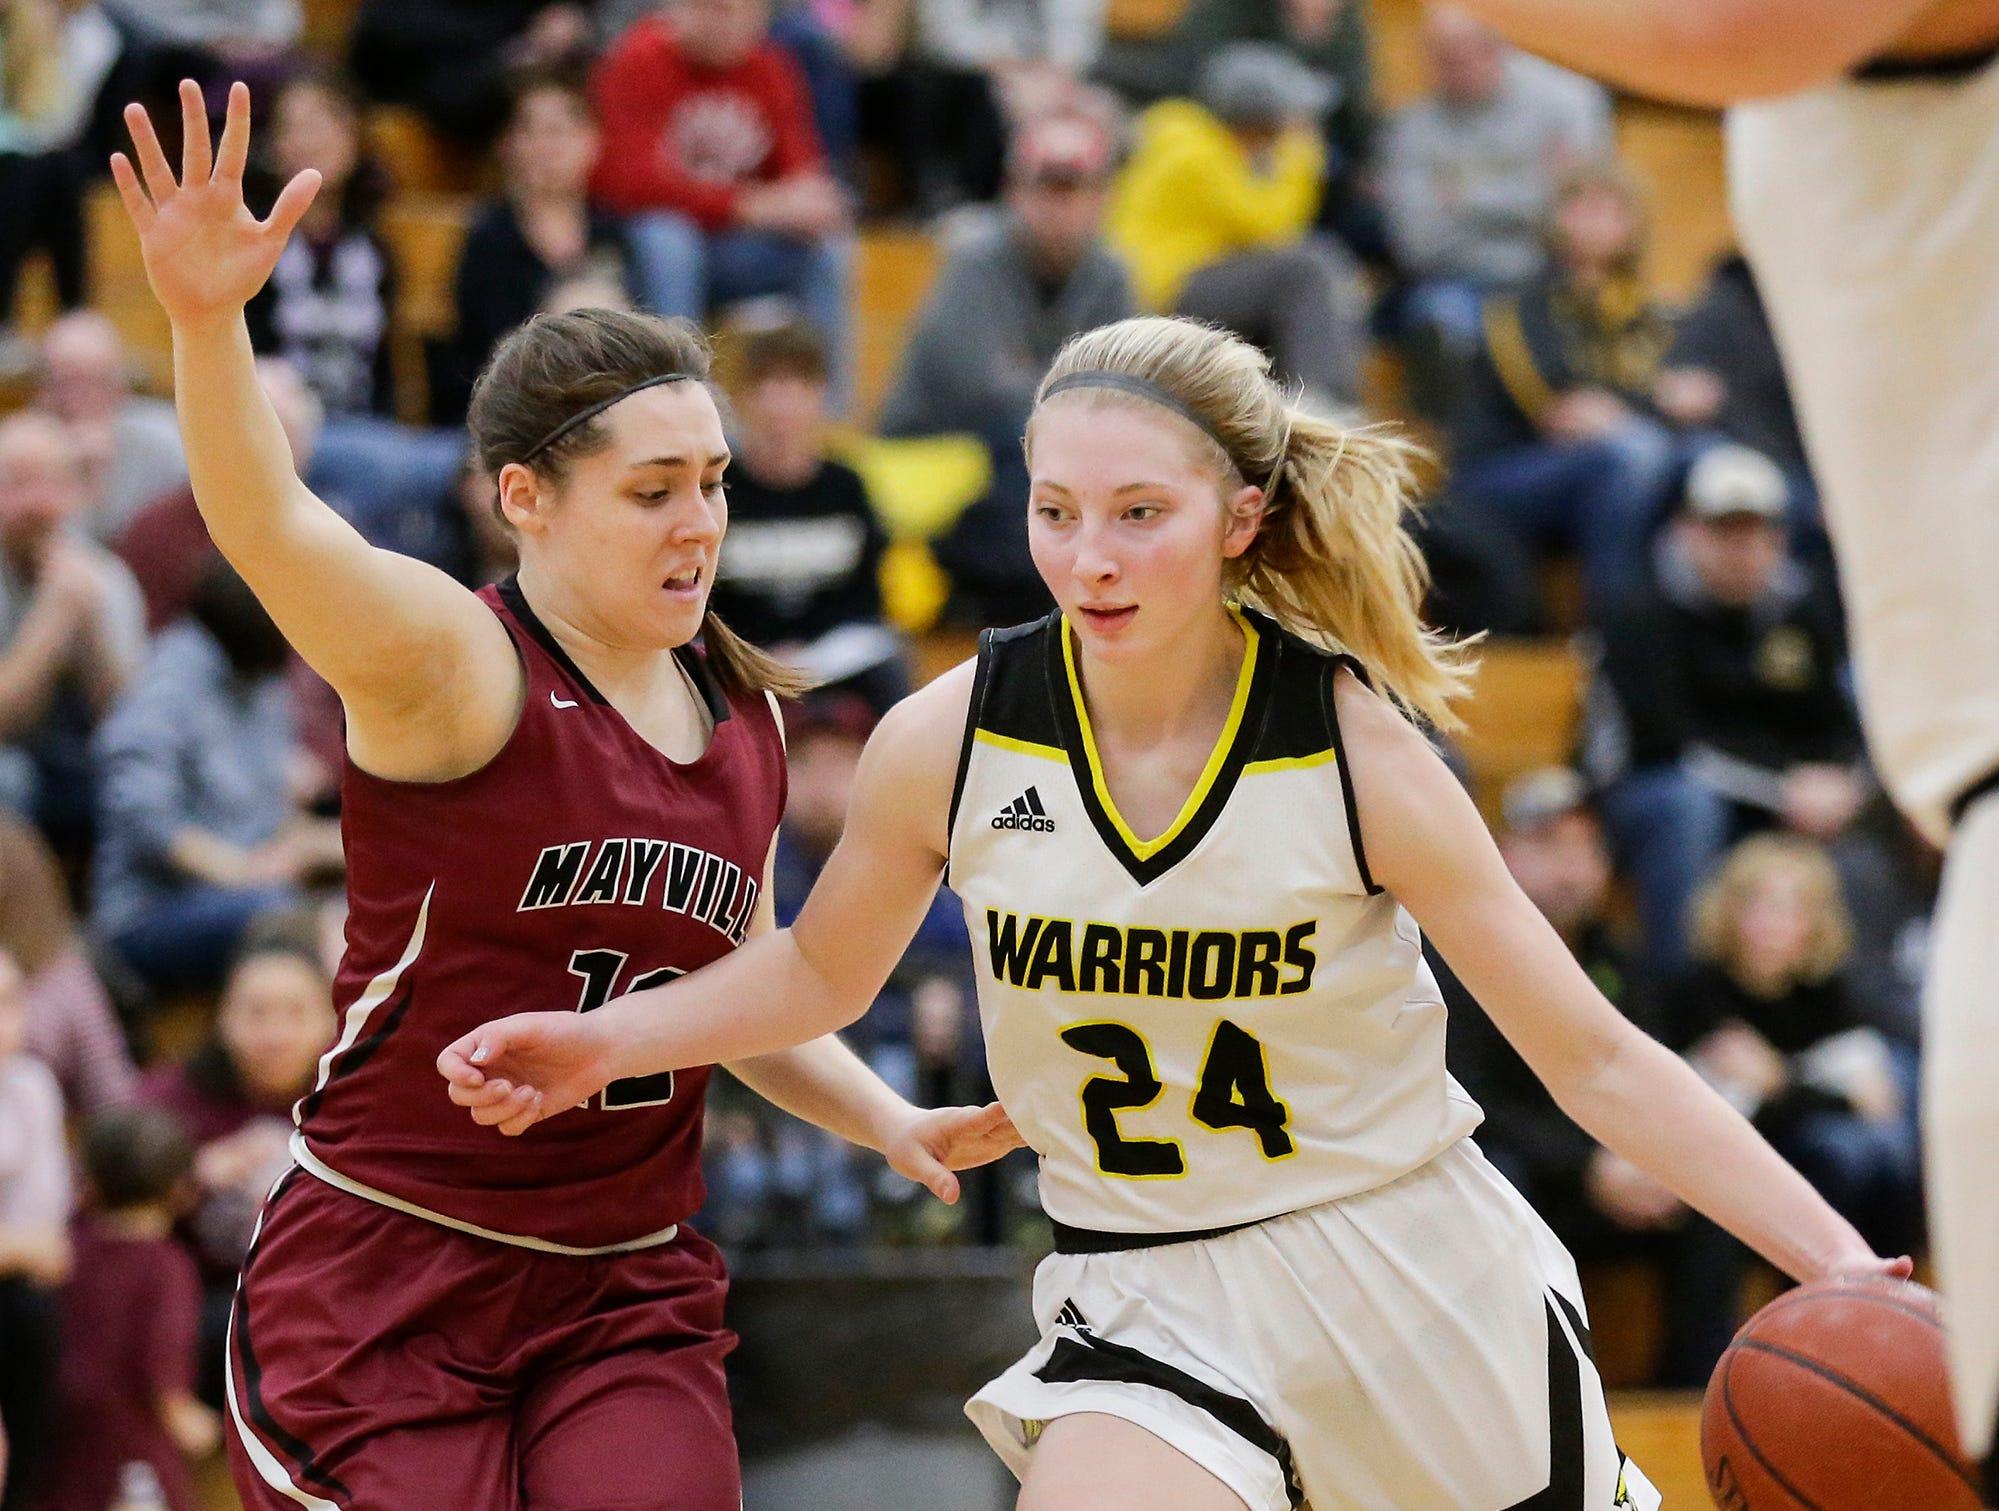 Waupun High School girls basketball's Peyton McGinnis (24) works her way past Mayville High School's Alaina Wagner (12) Saturday, February 23, 2019 during their WIAA Division 4 sectional quarterfinal game in Waupun. Waupun won the game 62-45. Doug Raflik/USA TODAY NETWORK-Wisconsin